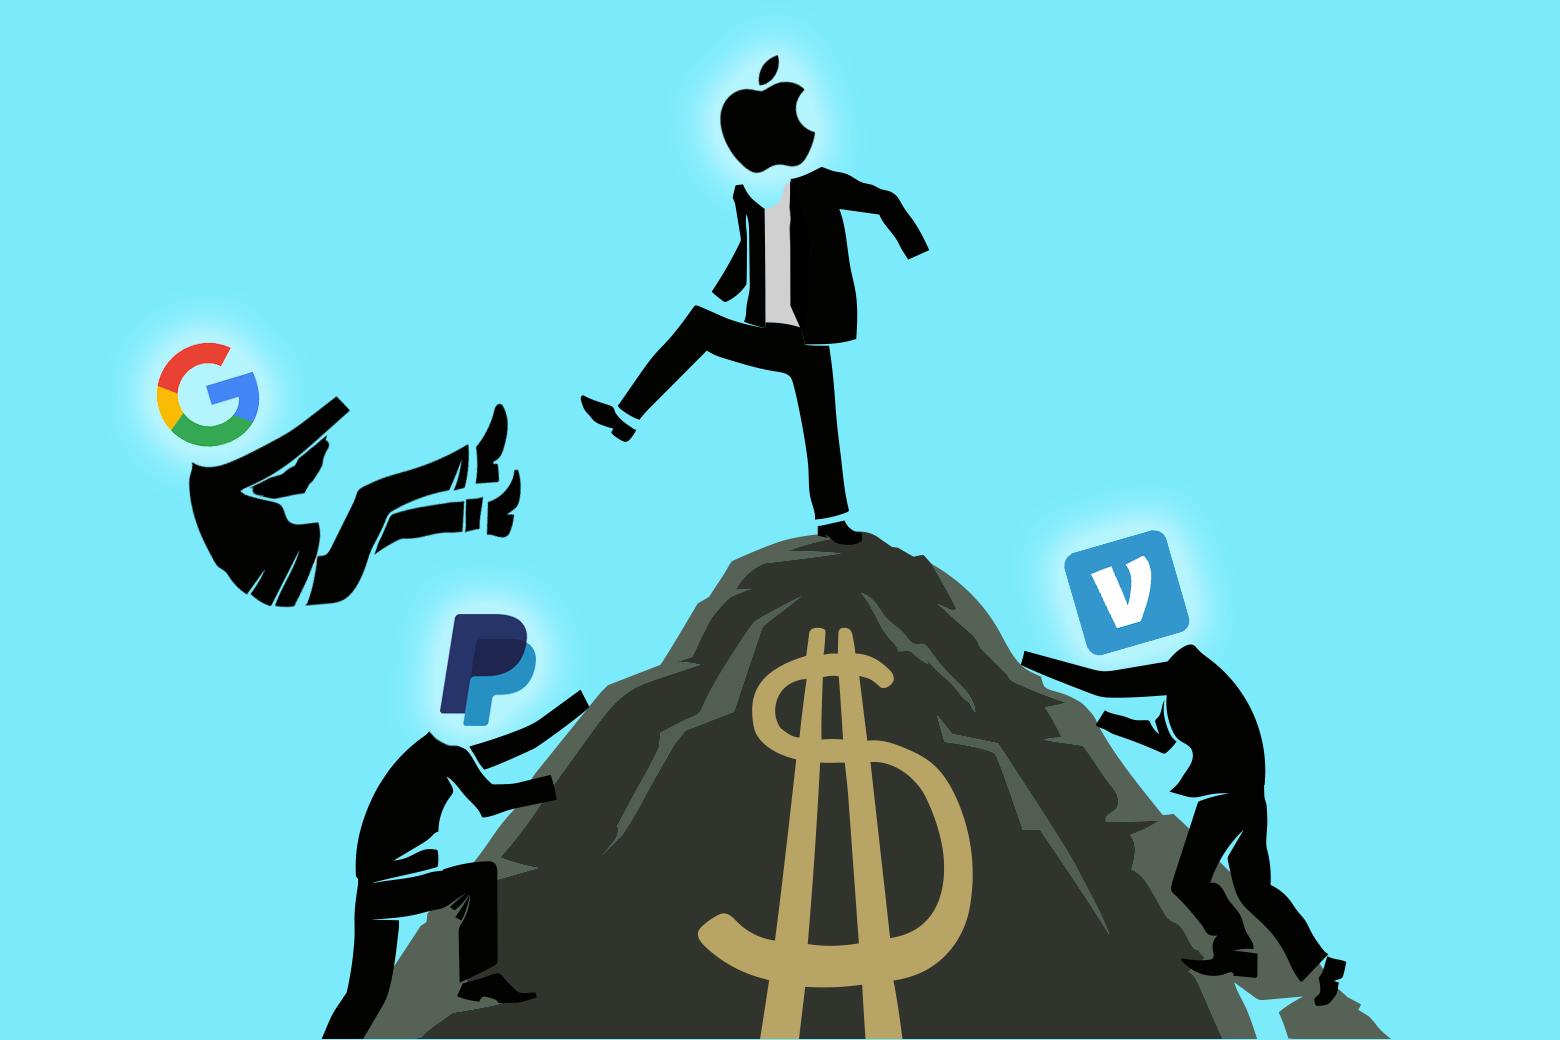 slate.com - Christina Bonnington - How Apple Plans to Win the Mobile Payment War